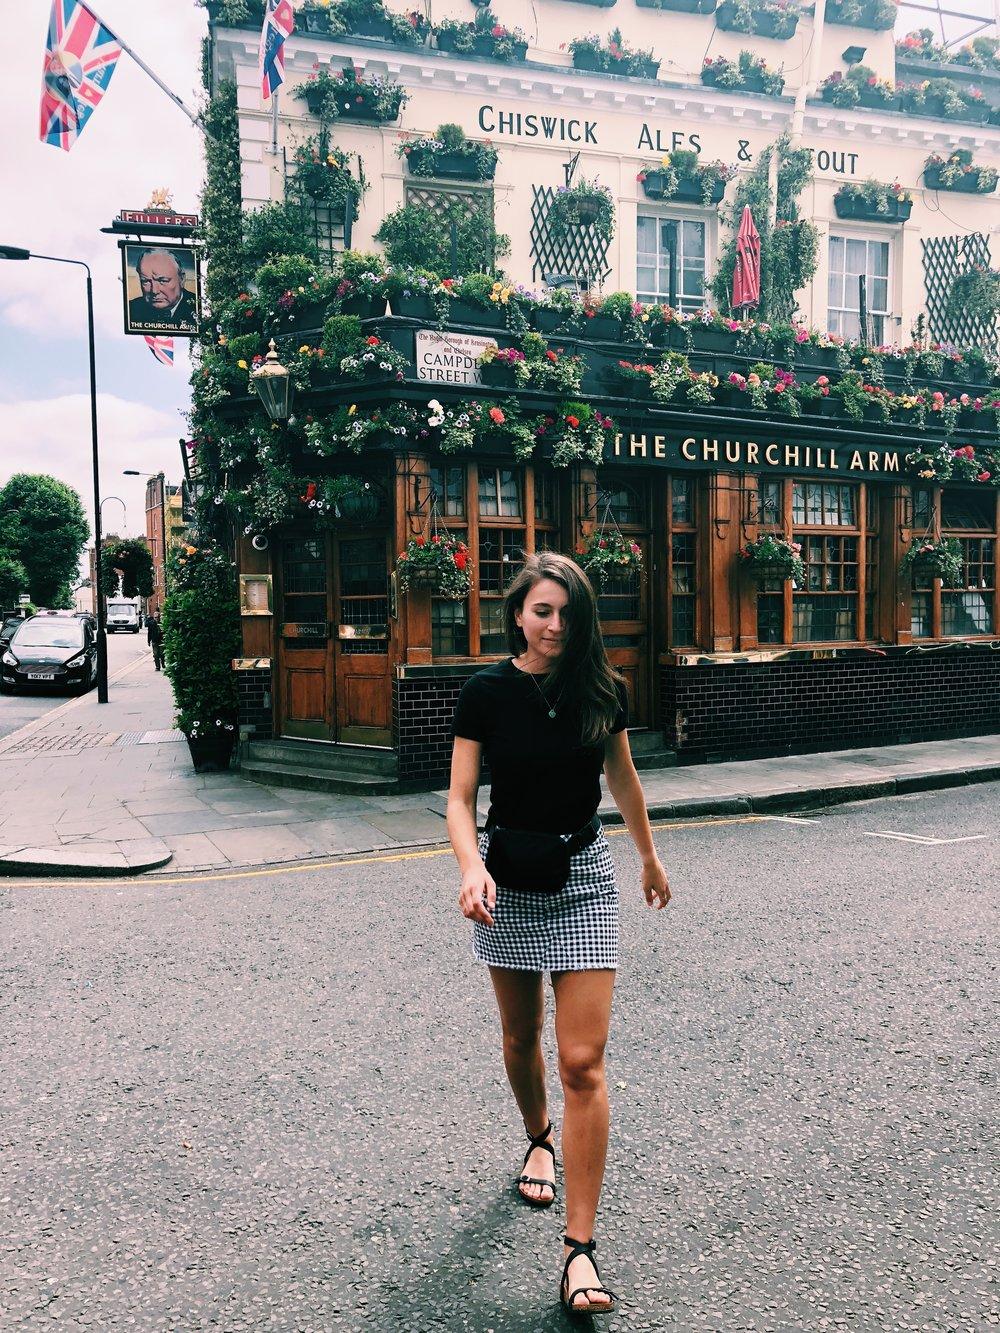 flower-pub-london.JPG